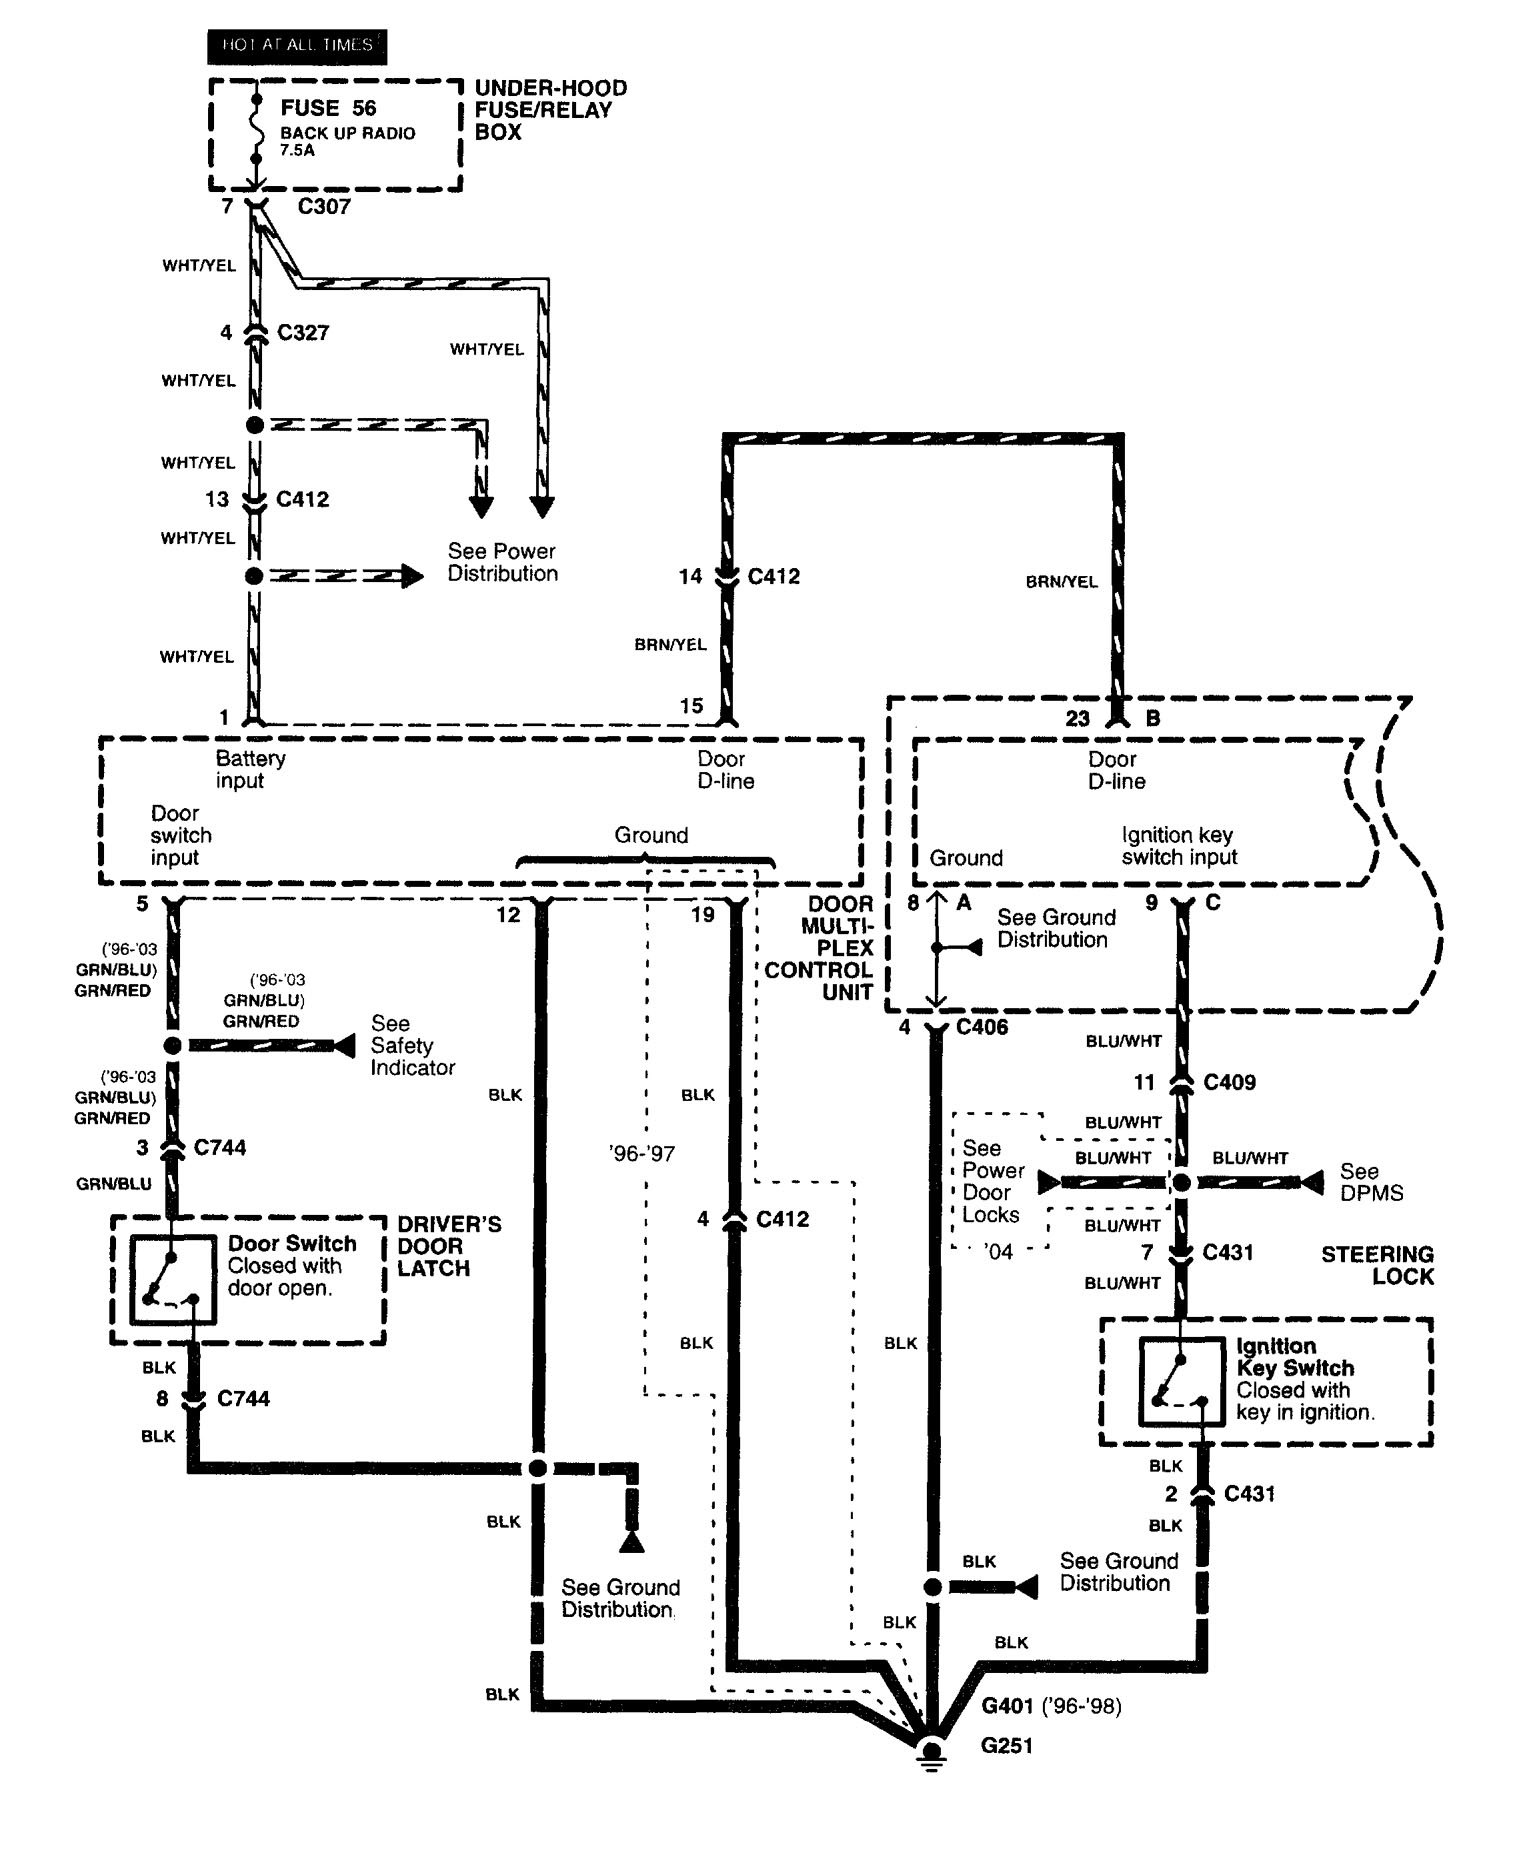 [SCHEMATICS_4ER]  Acura RL (2003 - 2004) - wiring diagrams - seat belt warning -  Carknowledge.info | Wiring Diagram Seat Belt Reminder |  | Carknowledge.info